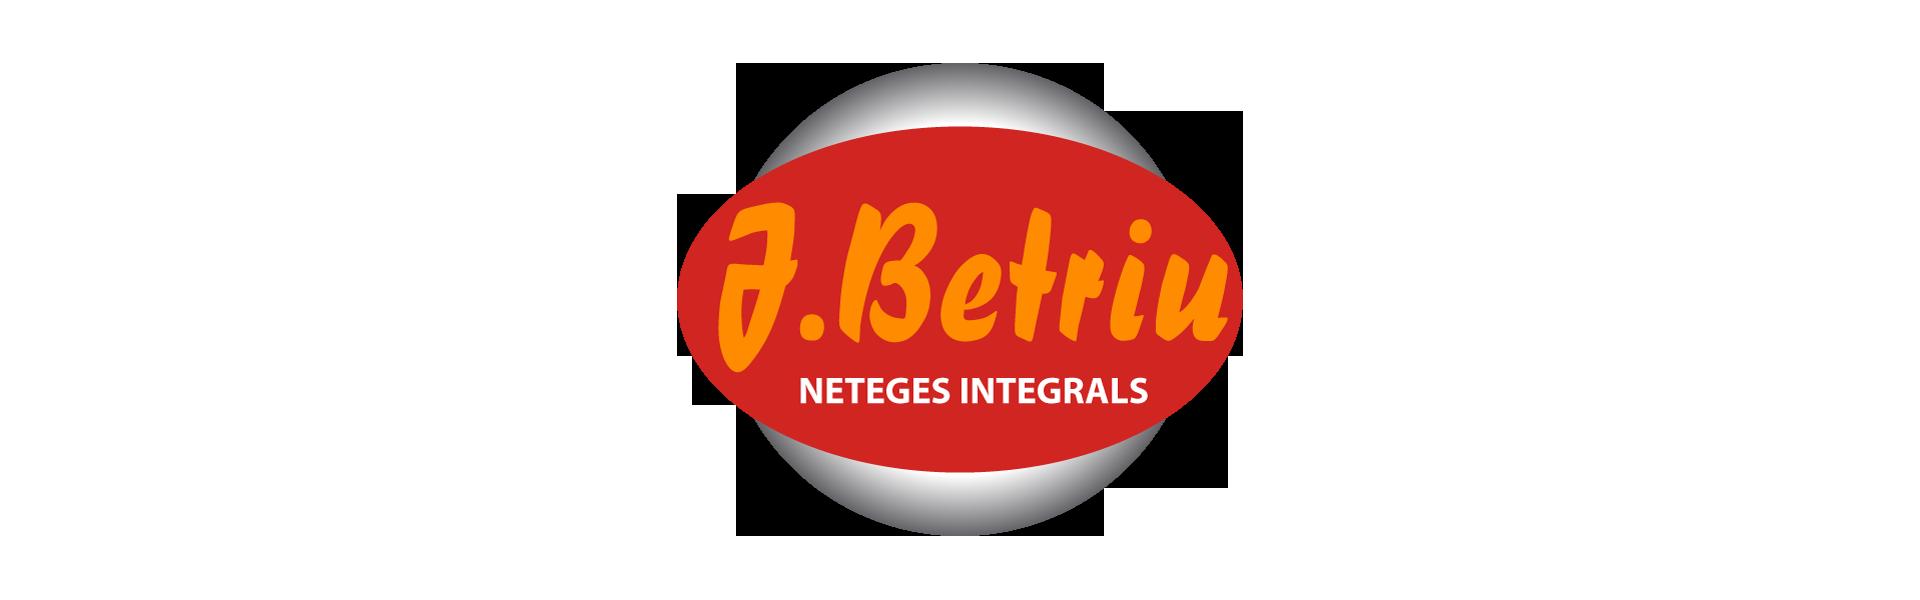 desatascos económicos Lleida Jbetriu logo